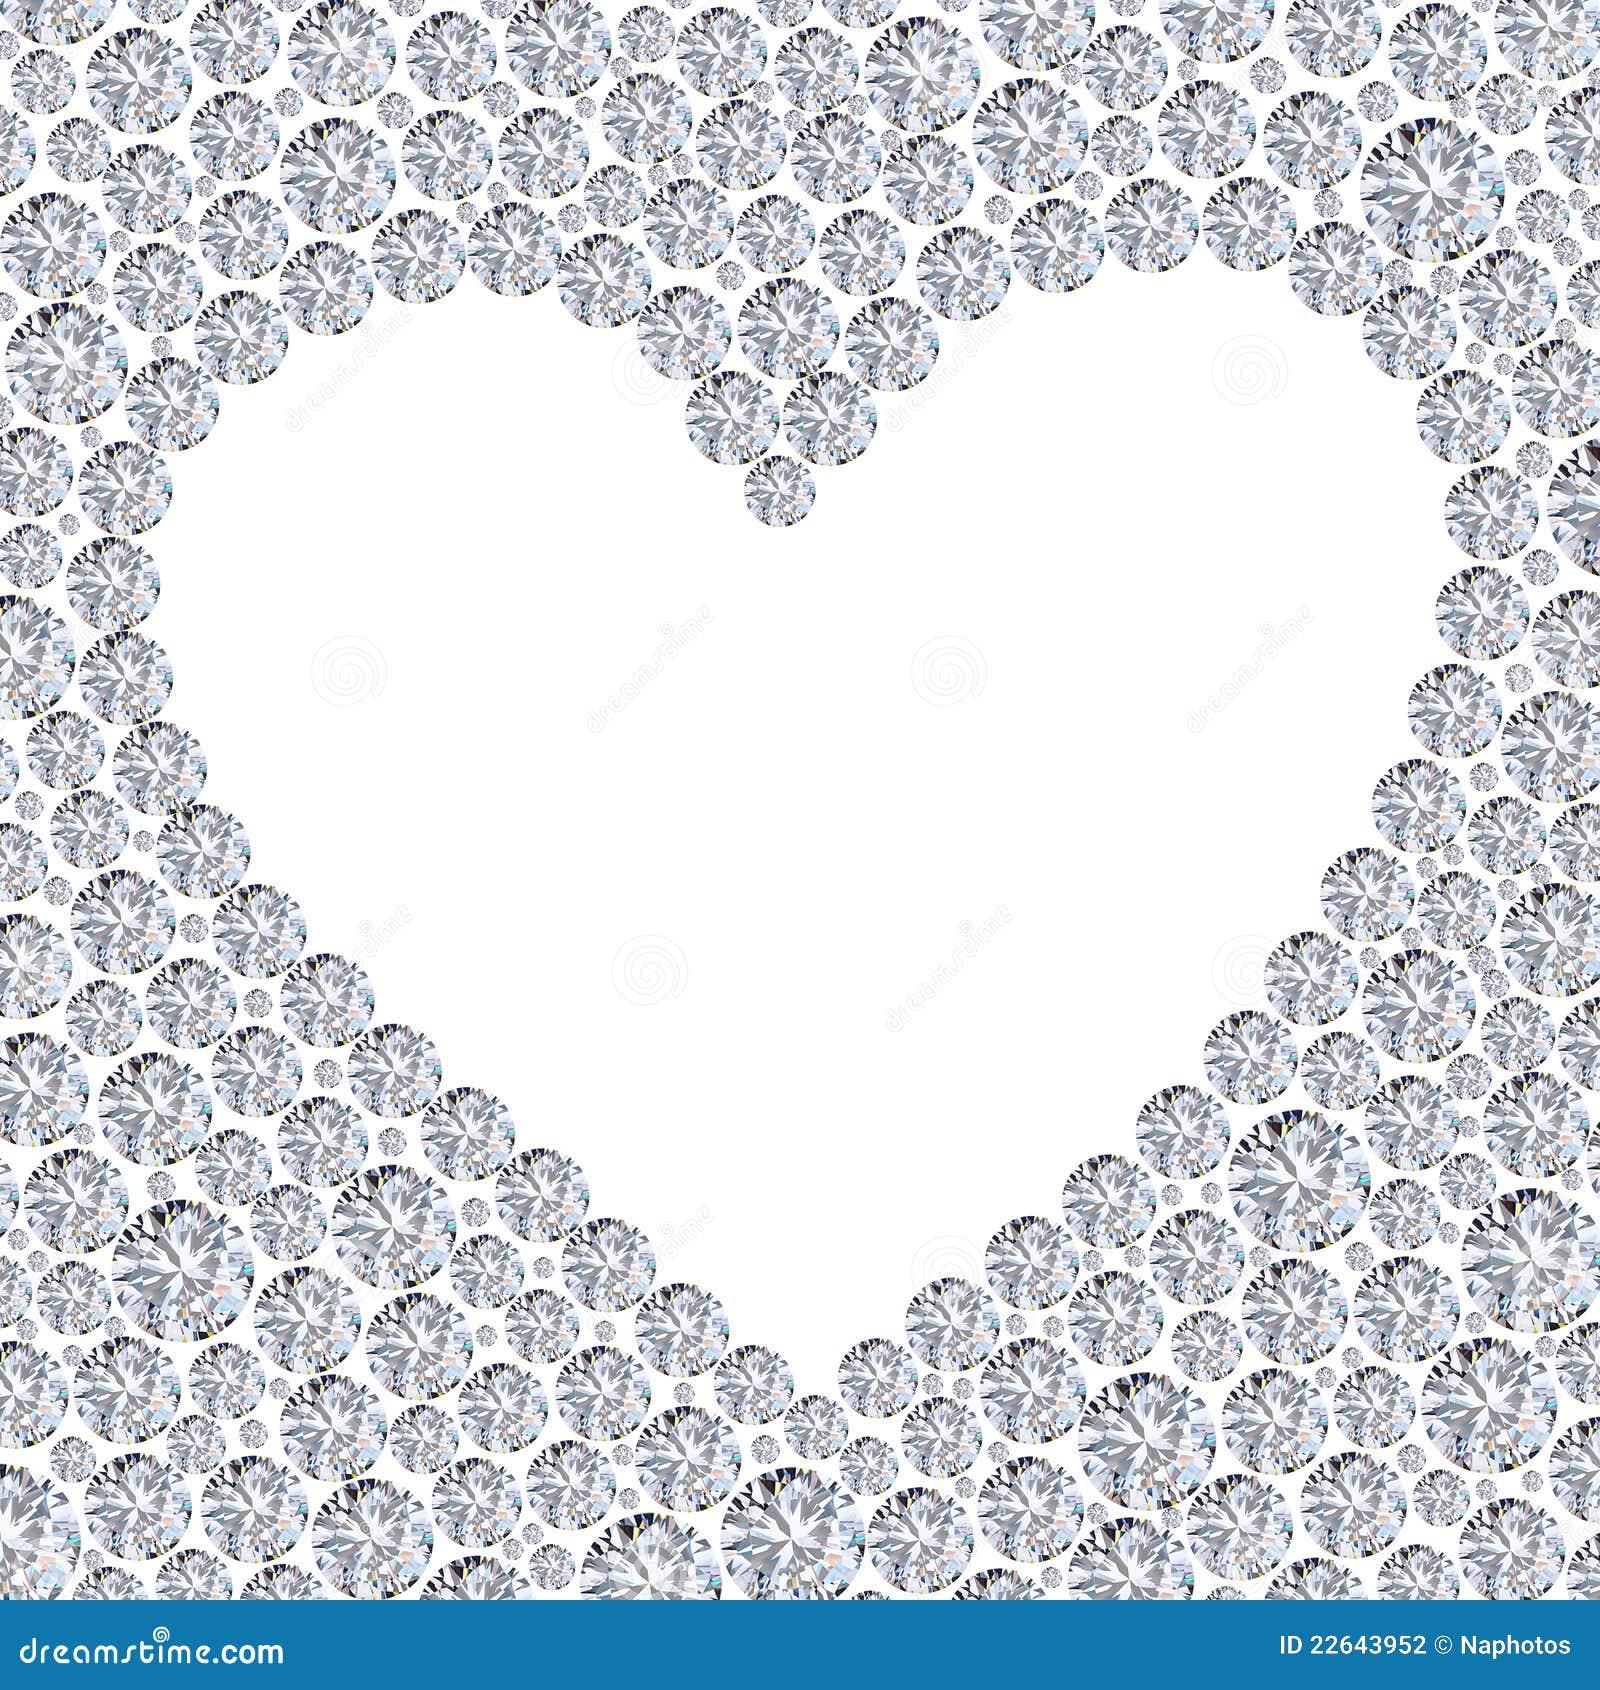 Diamond heart frame stock illustration. Illustration of gemstone ...